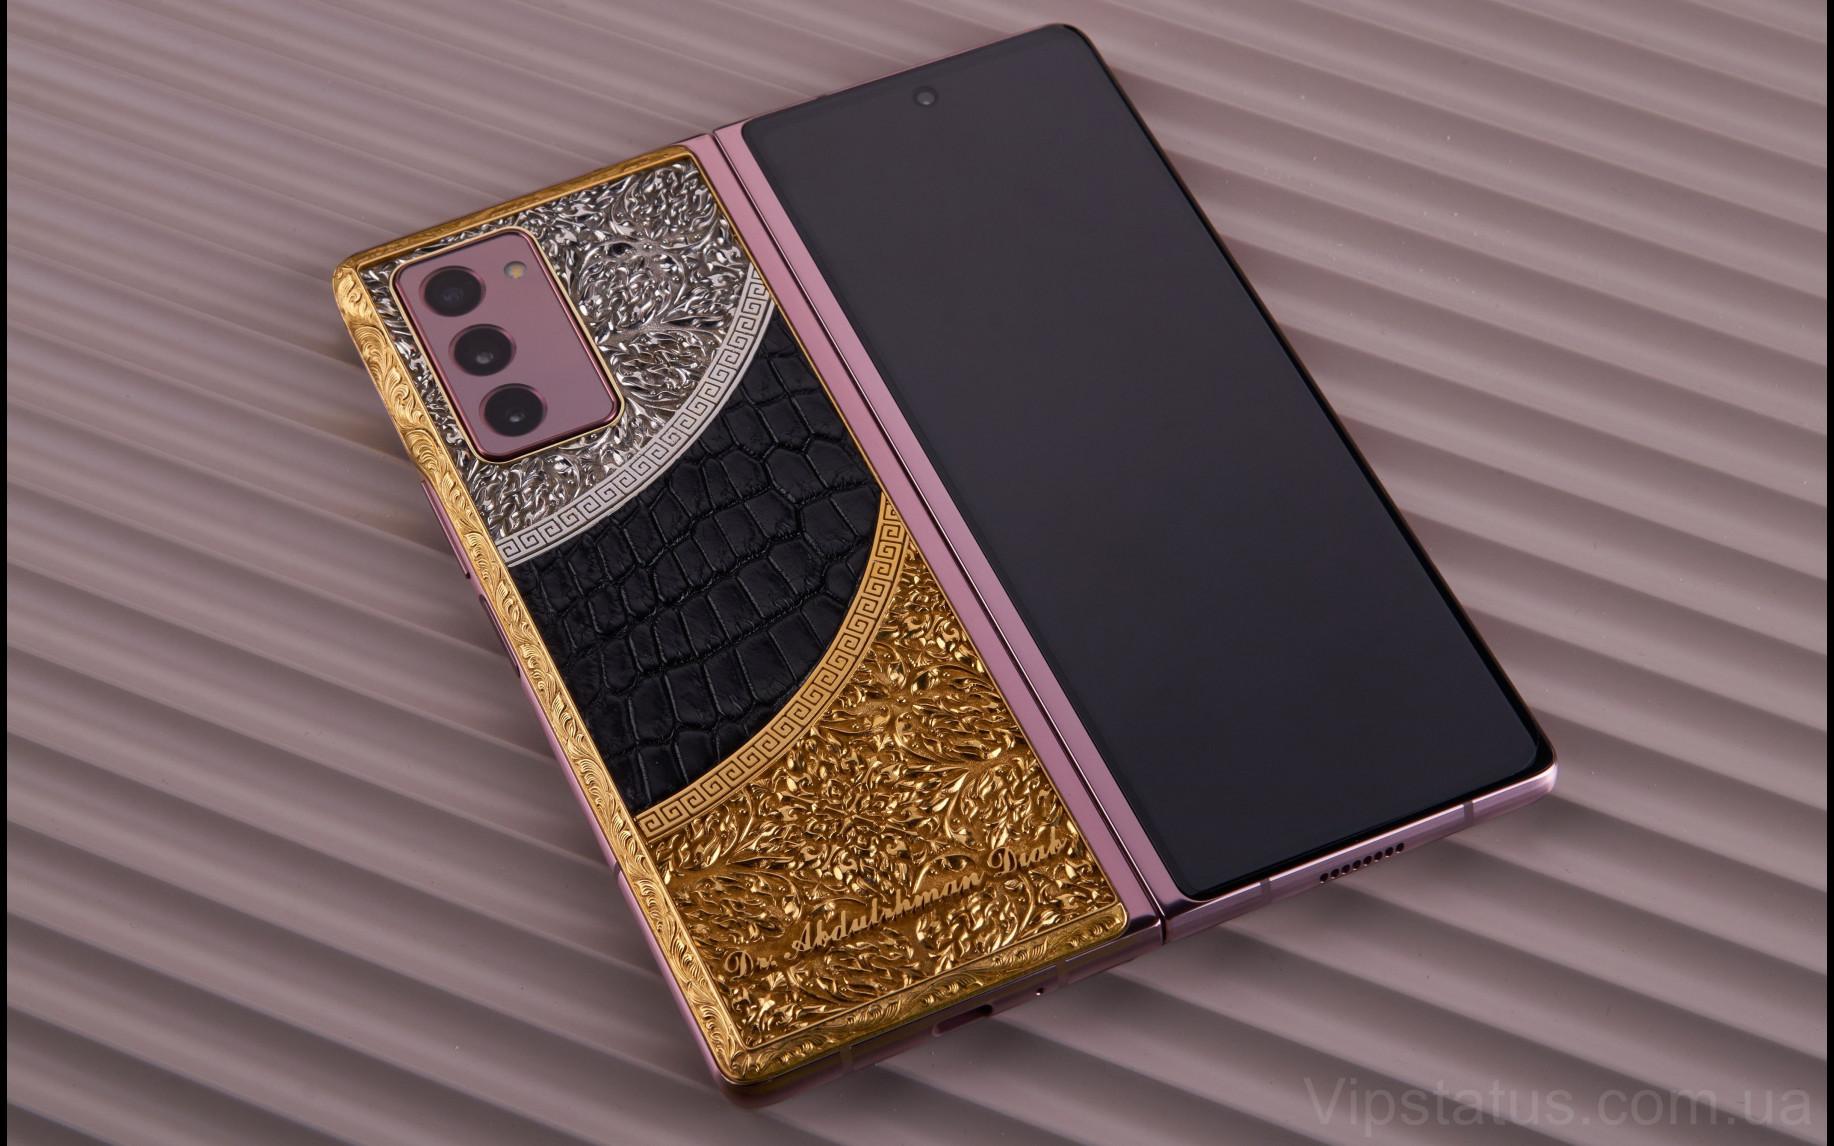 Elite Эксклюзивный телефон Samsung Z Fold 2 Exclusive Phone Samsung Z Fold 2 image 5